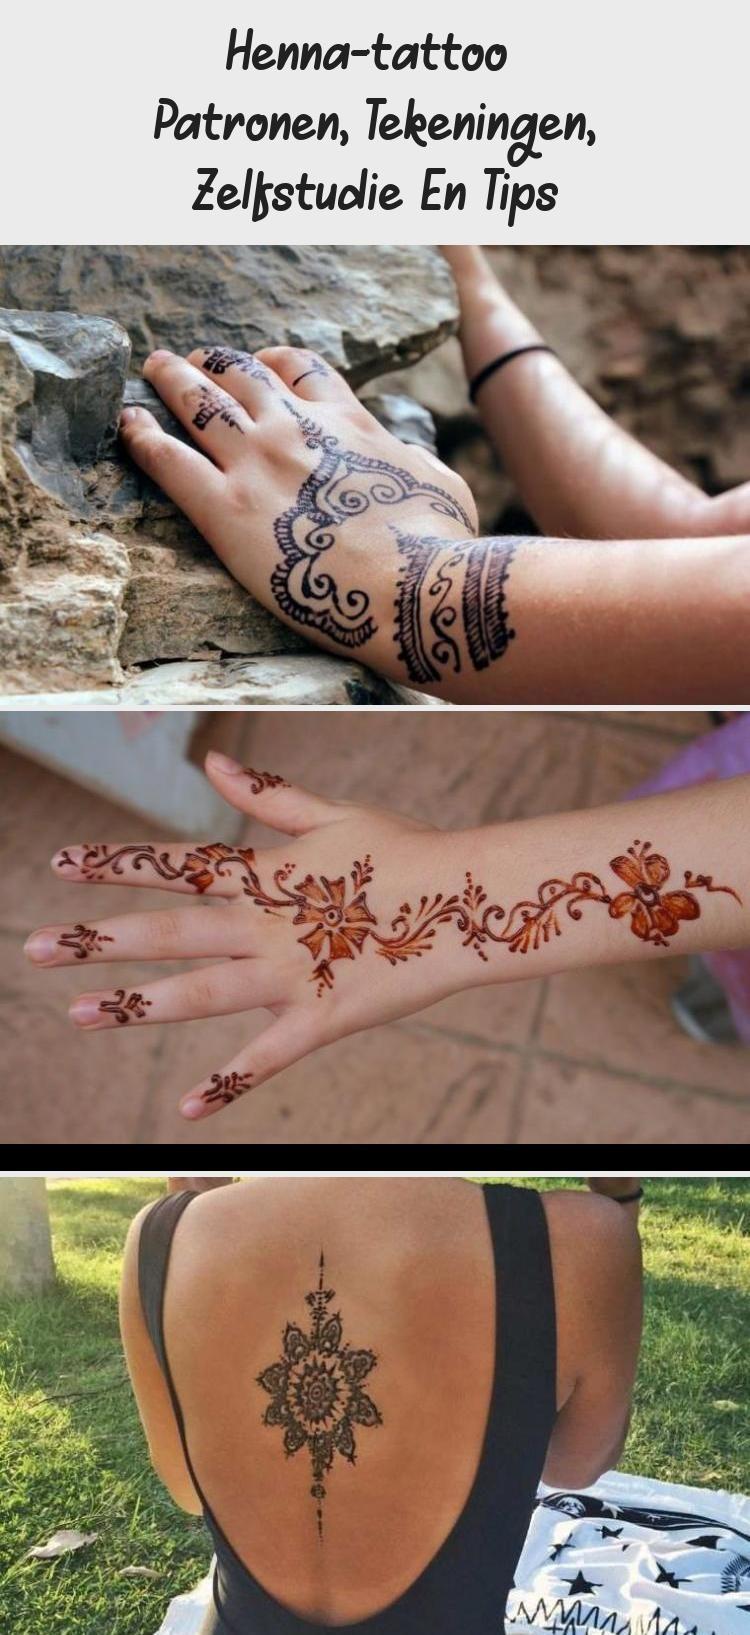 Henna Tattoo Patronen Tekeningen Zelfstudie En Tips Tattoos And Body Art Art Body Hennatattoo Patronen Tattoos Tekeningen Tips Zelfstudie